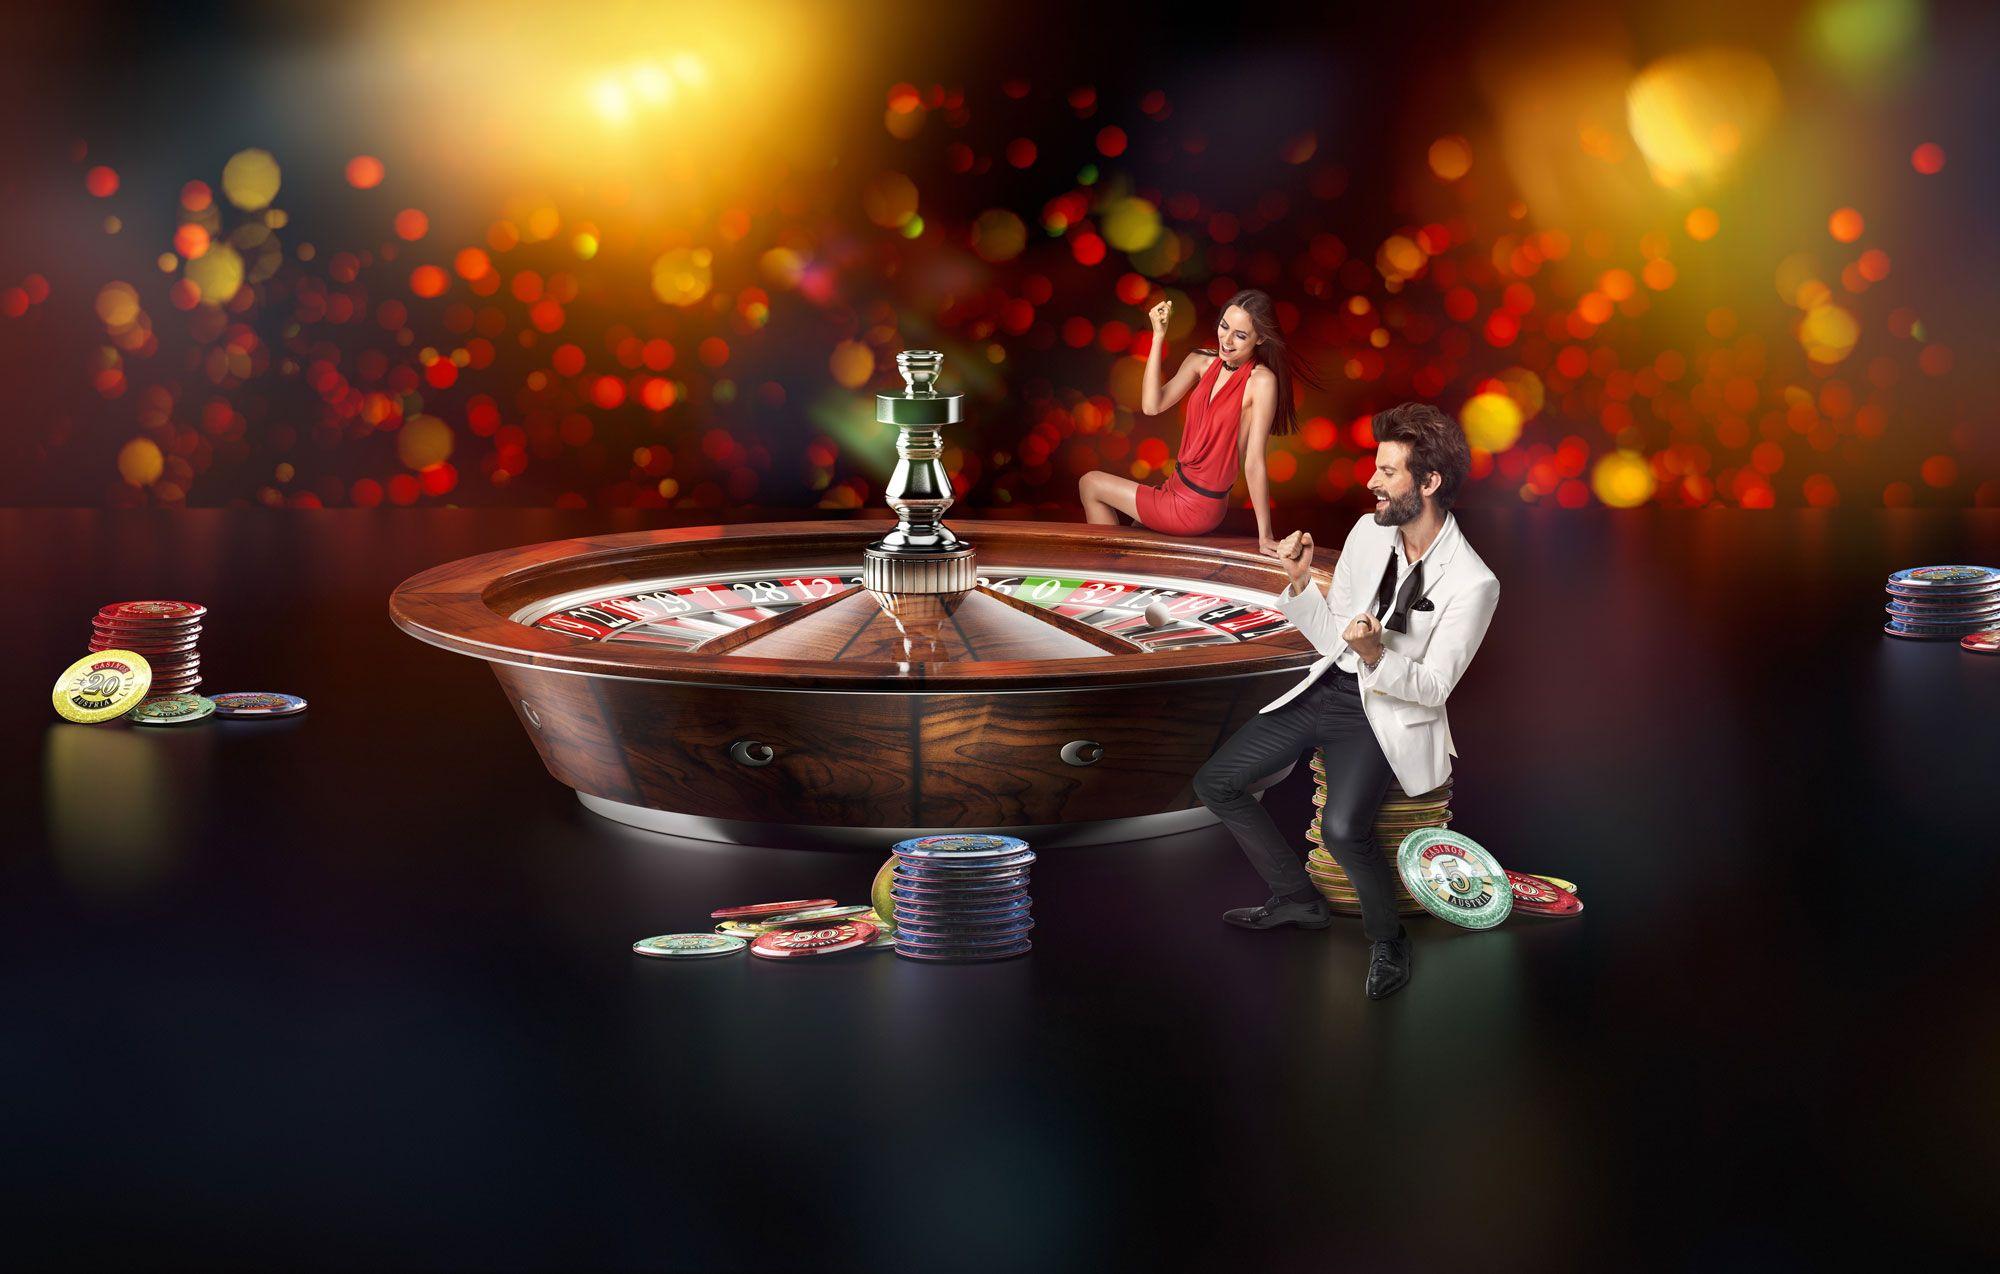 Casinos Austria Wien Jpg 2000 1274 Blackjack Casino Party Mainan